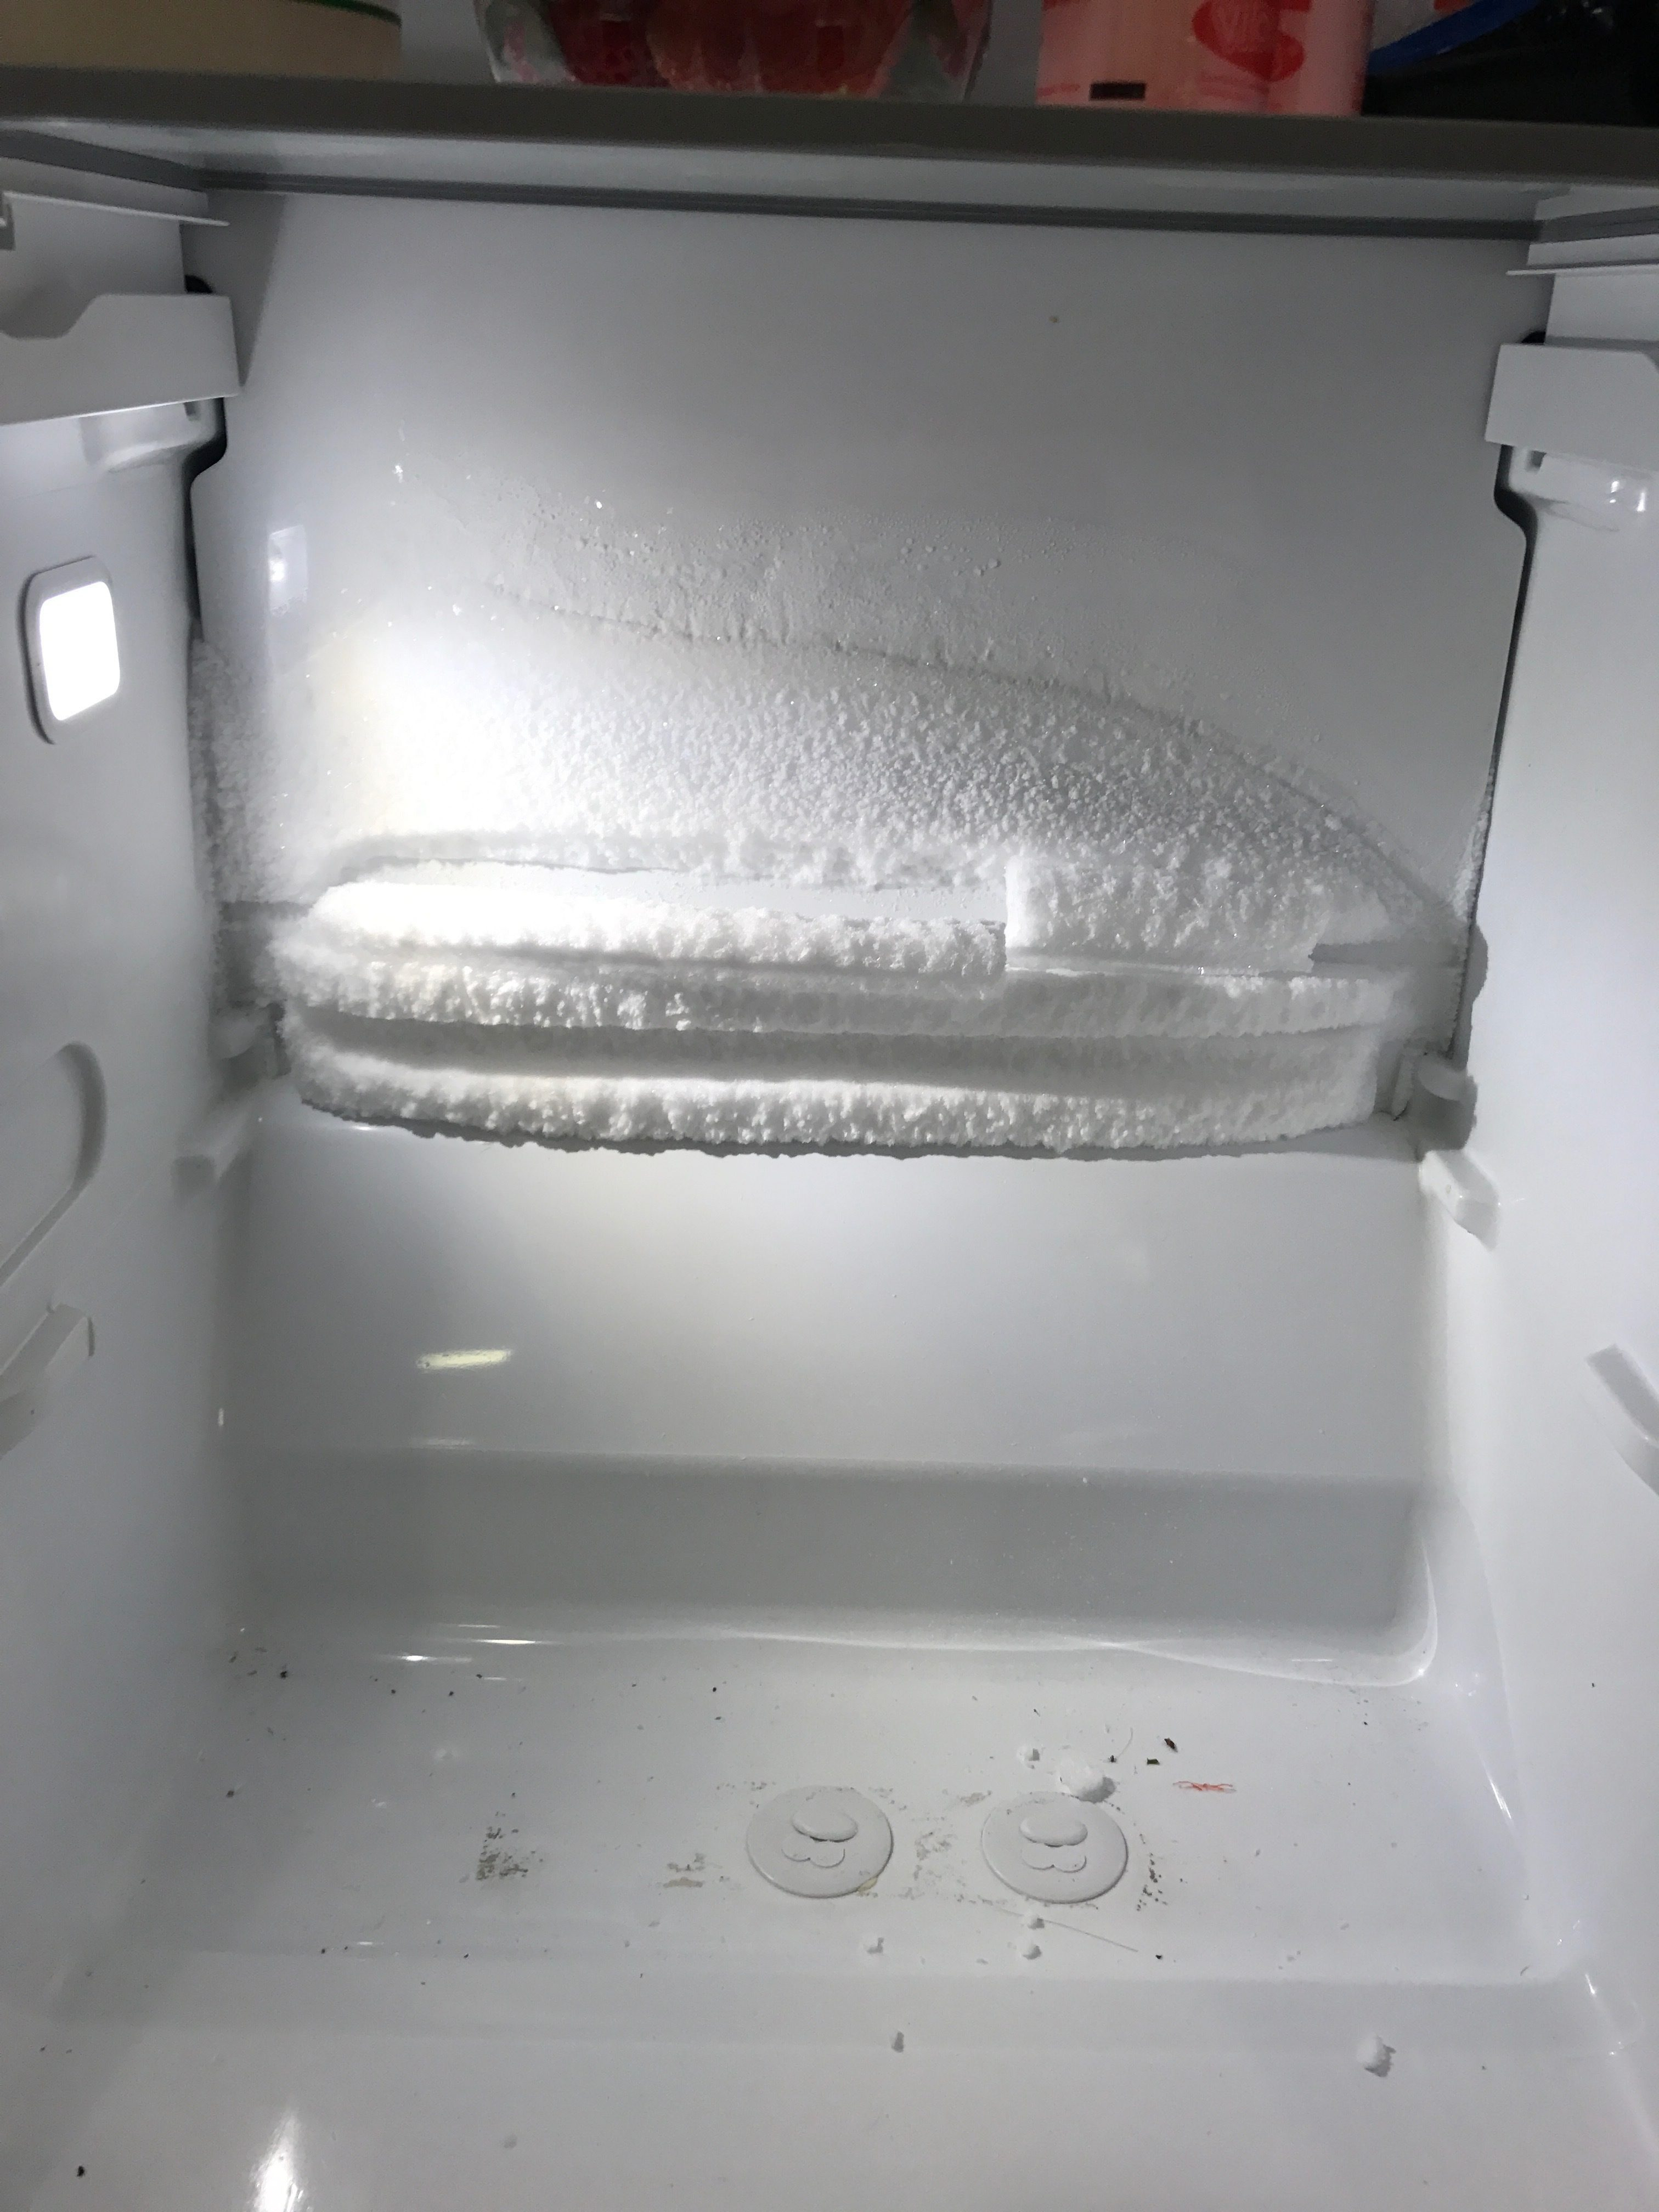 Top 791 Complaints and Reviews about KitchenAid Refrigerators